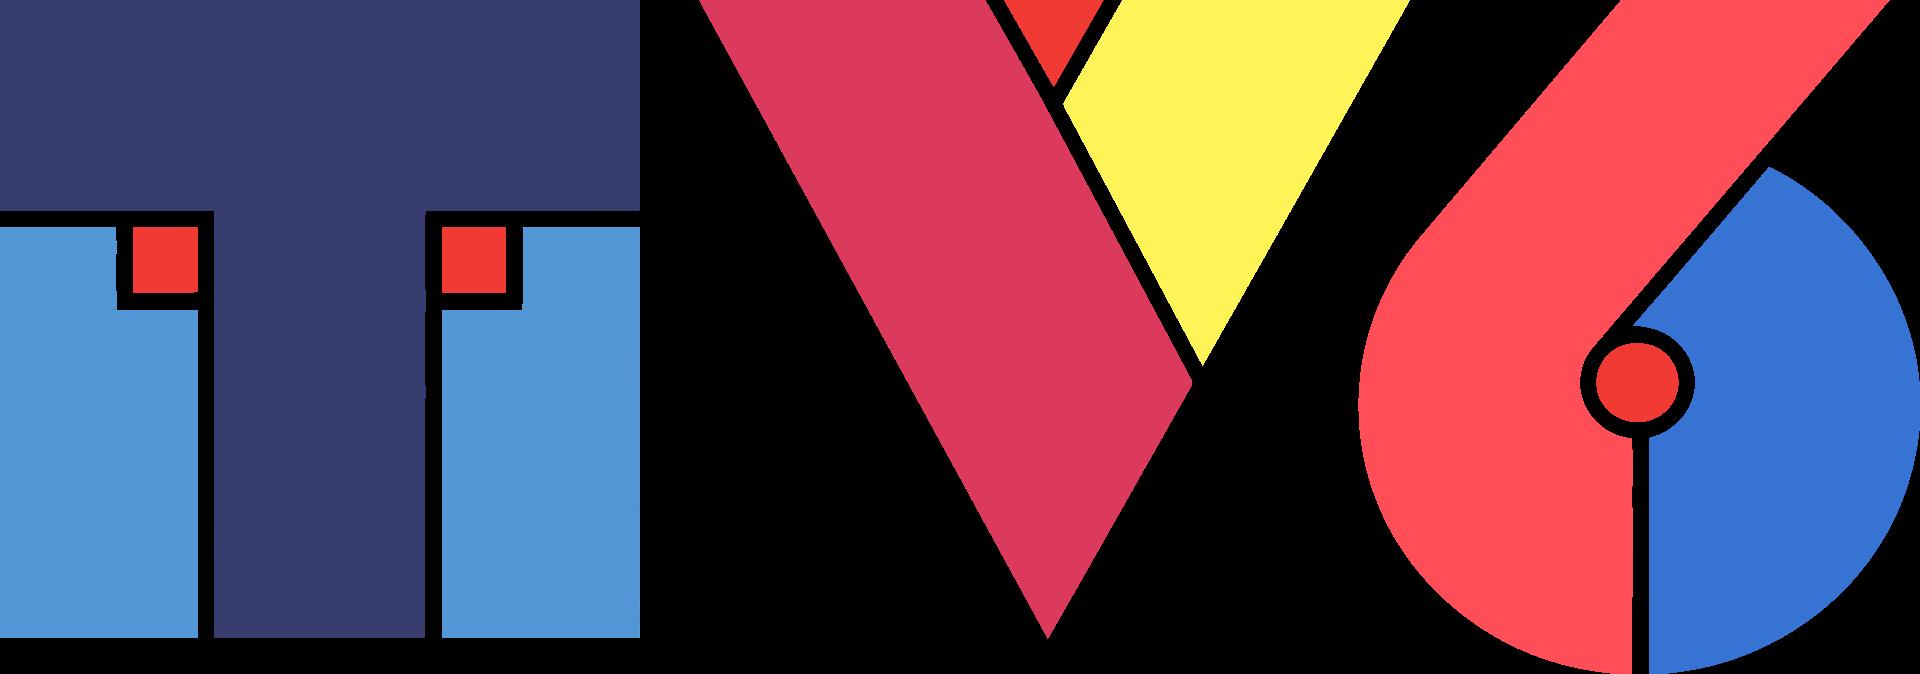 00 1986 TV6